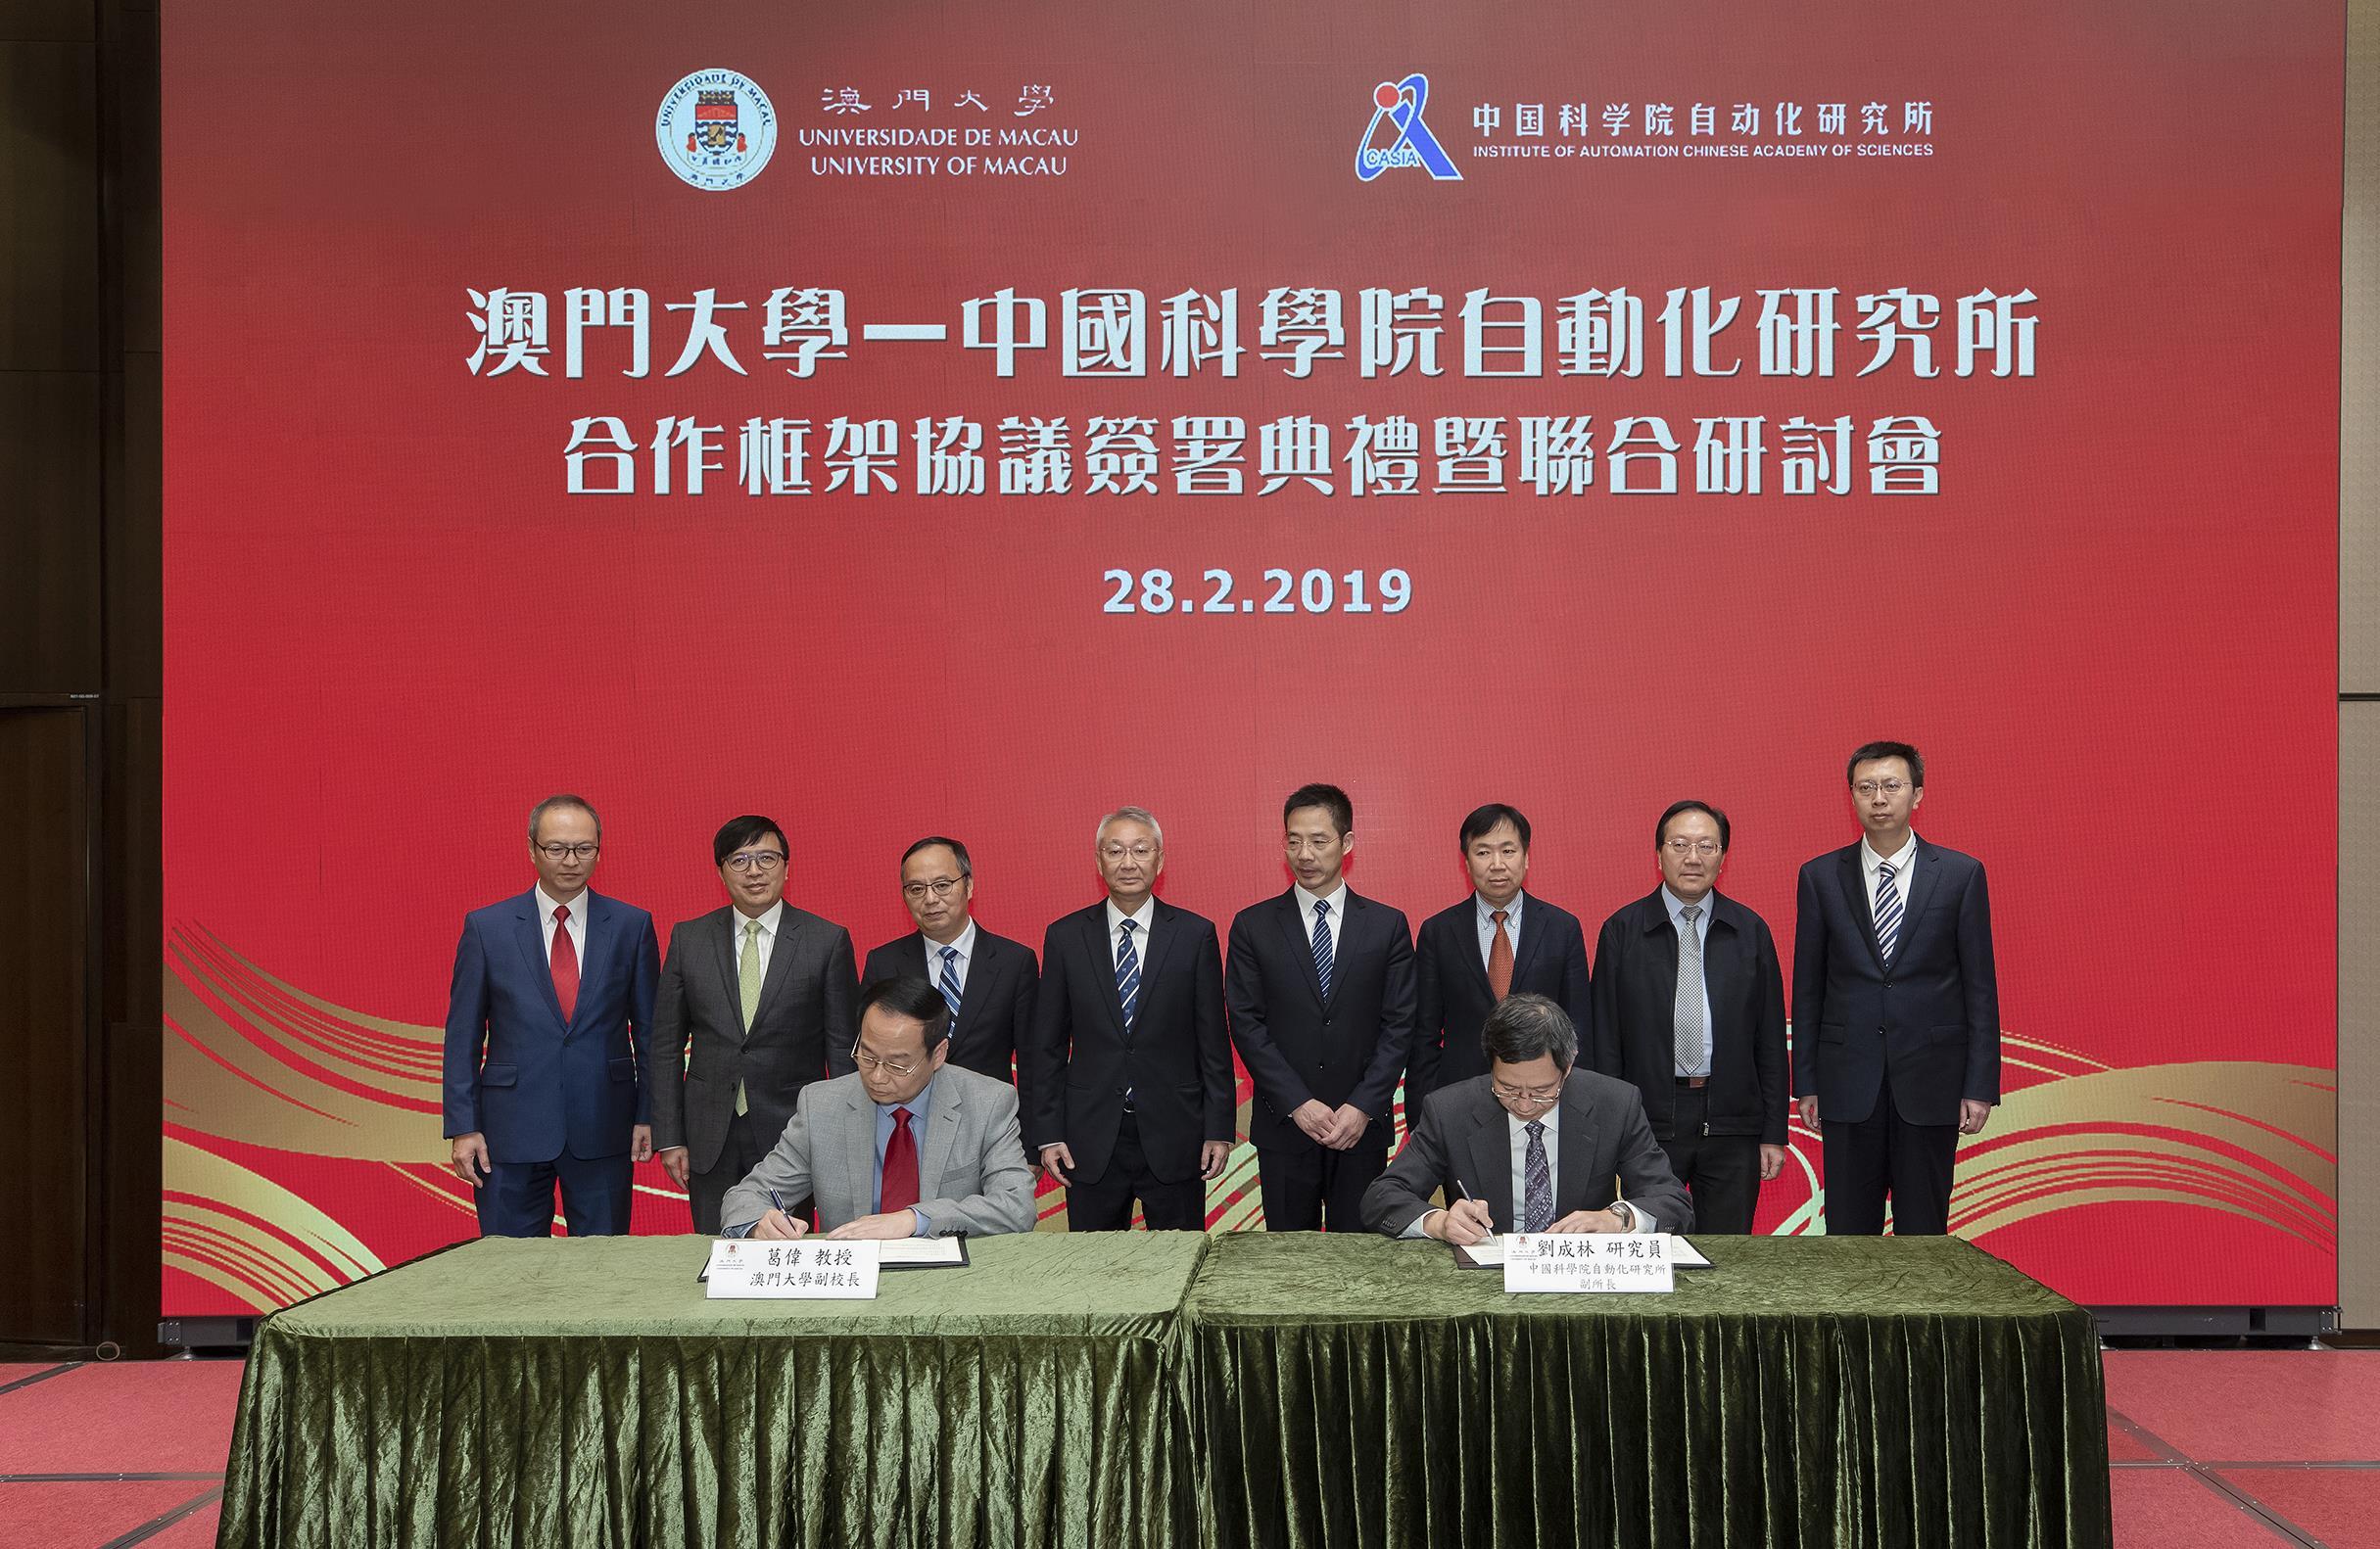 Both parties sign a collaborative framework agreement